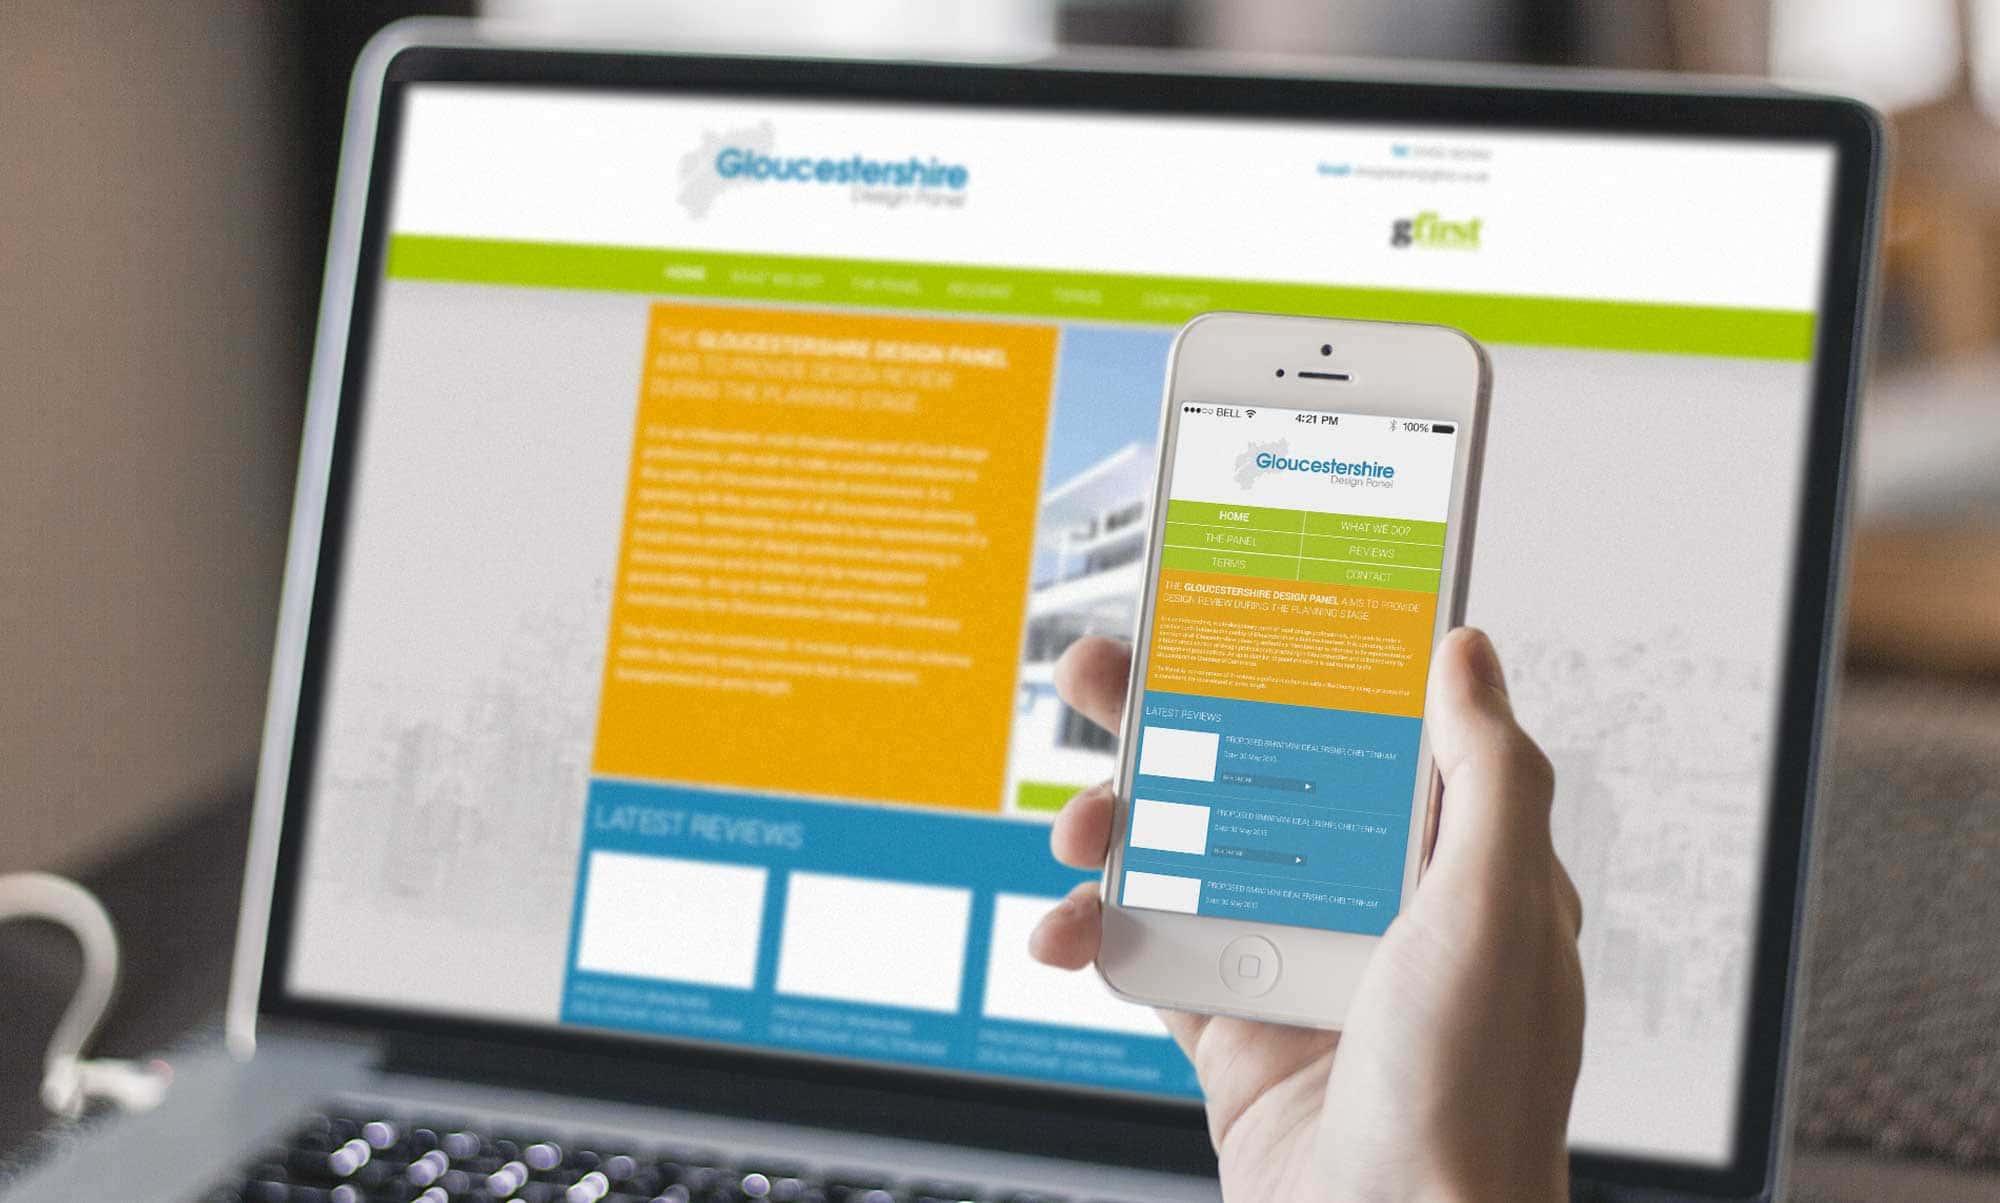 Gloucestershire Design Panel responsive website